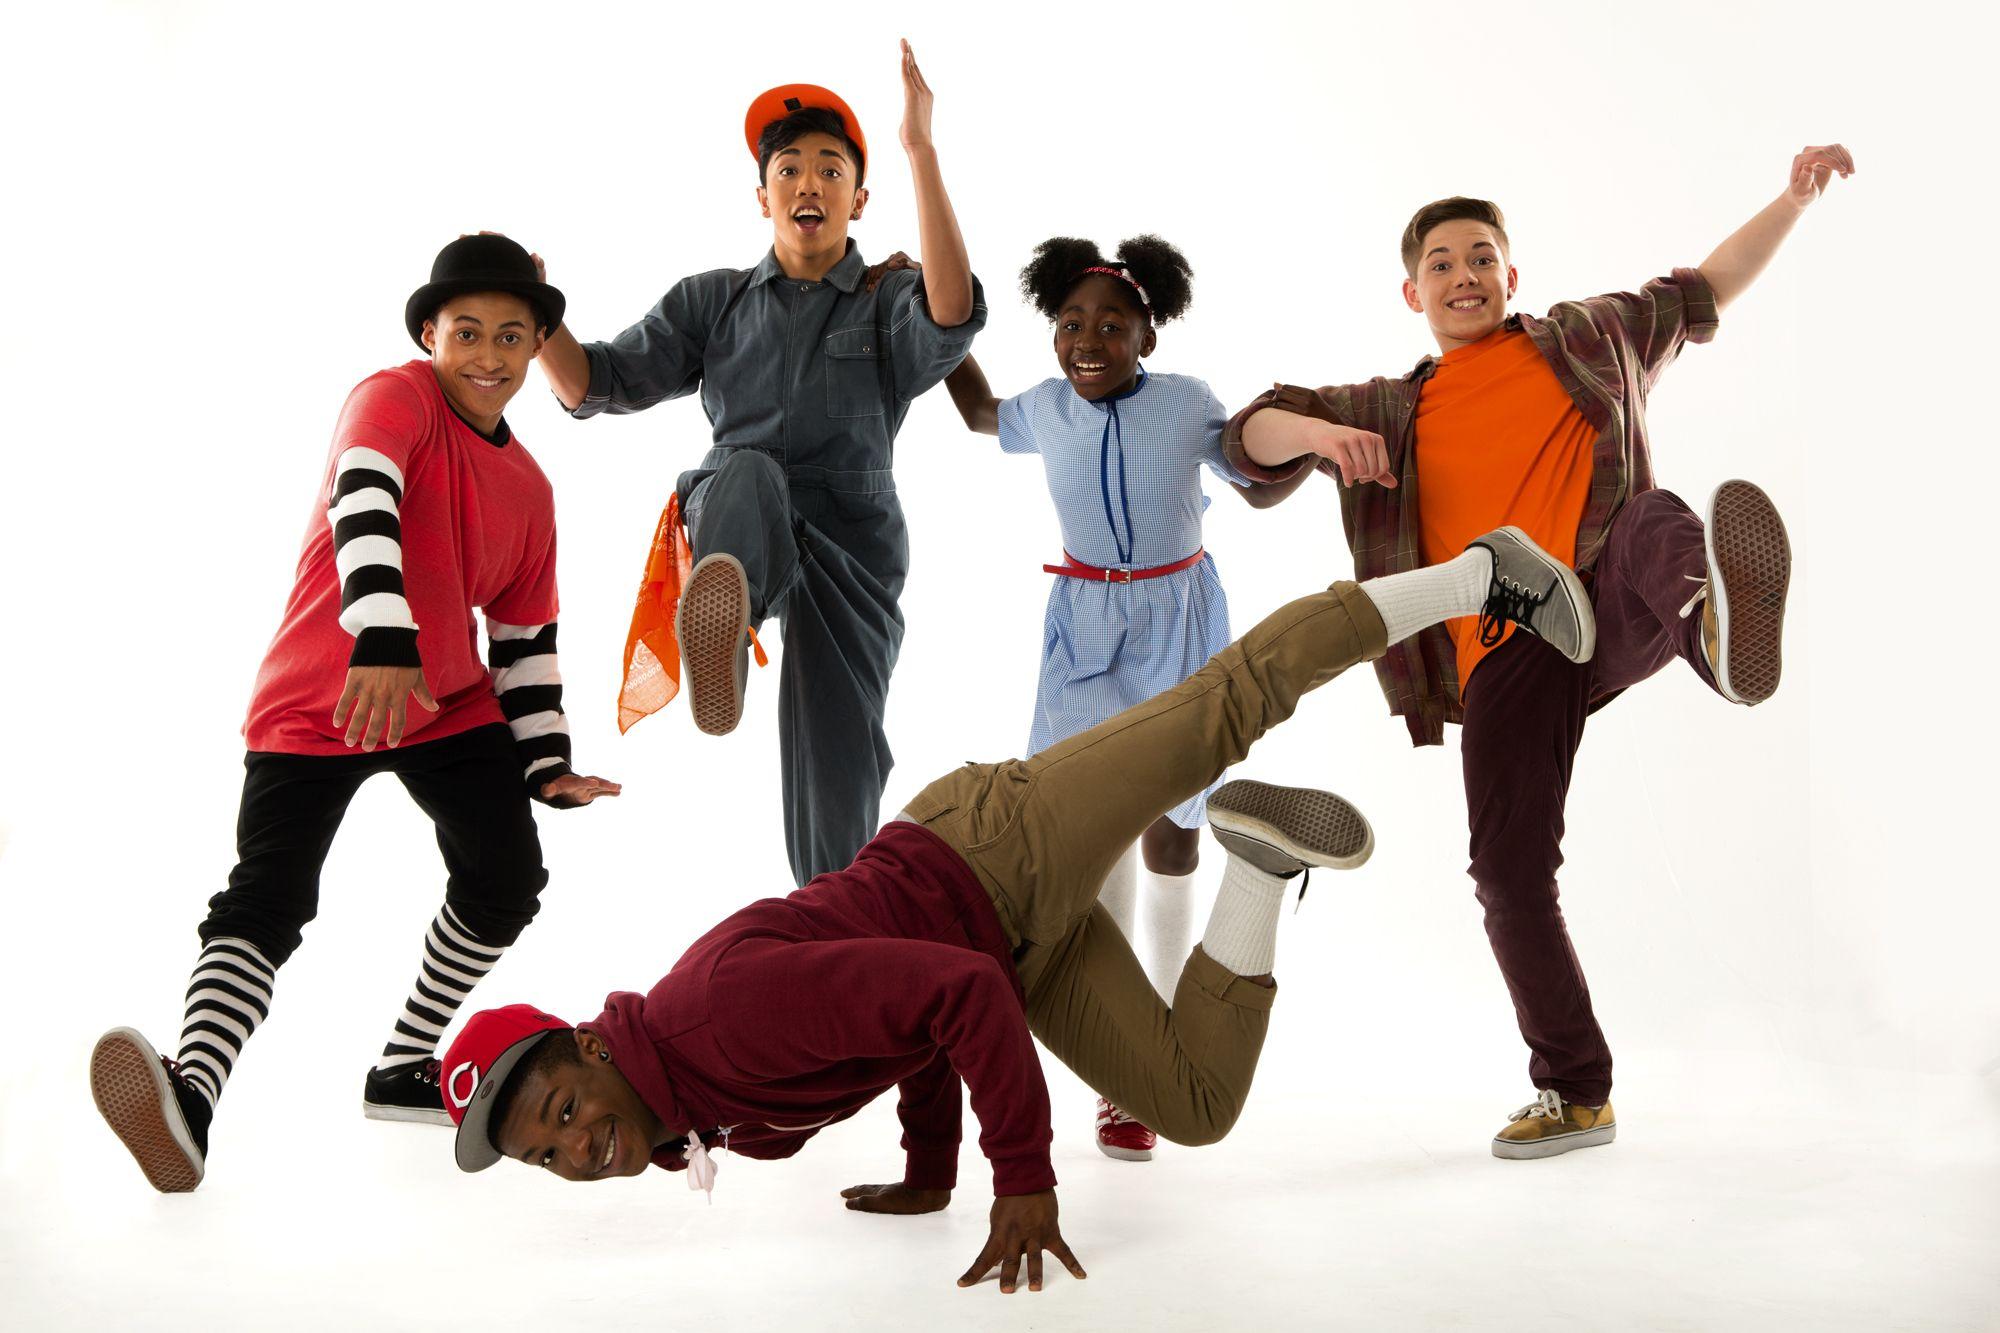 Image gallery for kids hip hop dance pictures hip hop